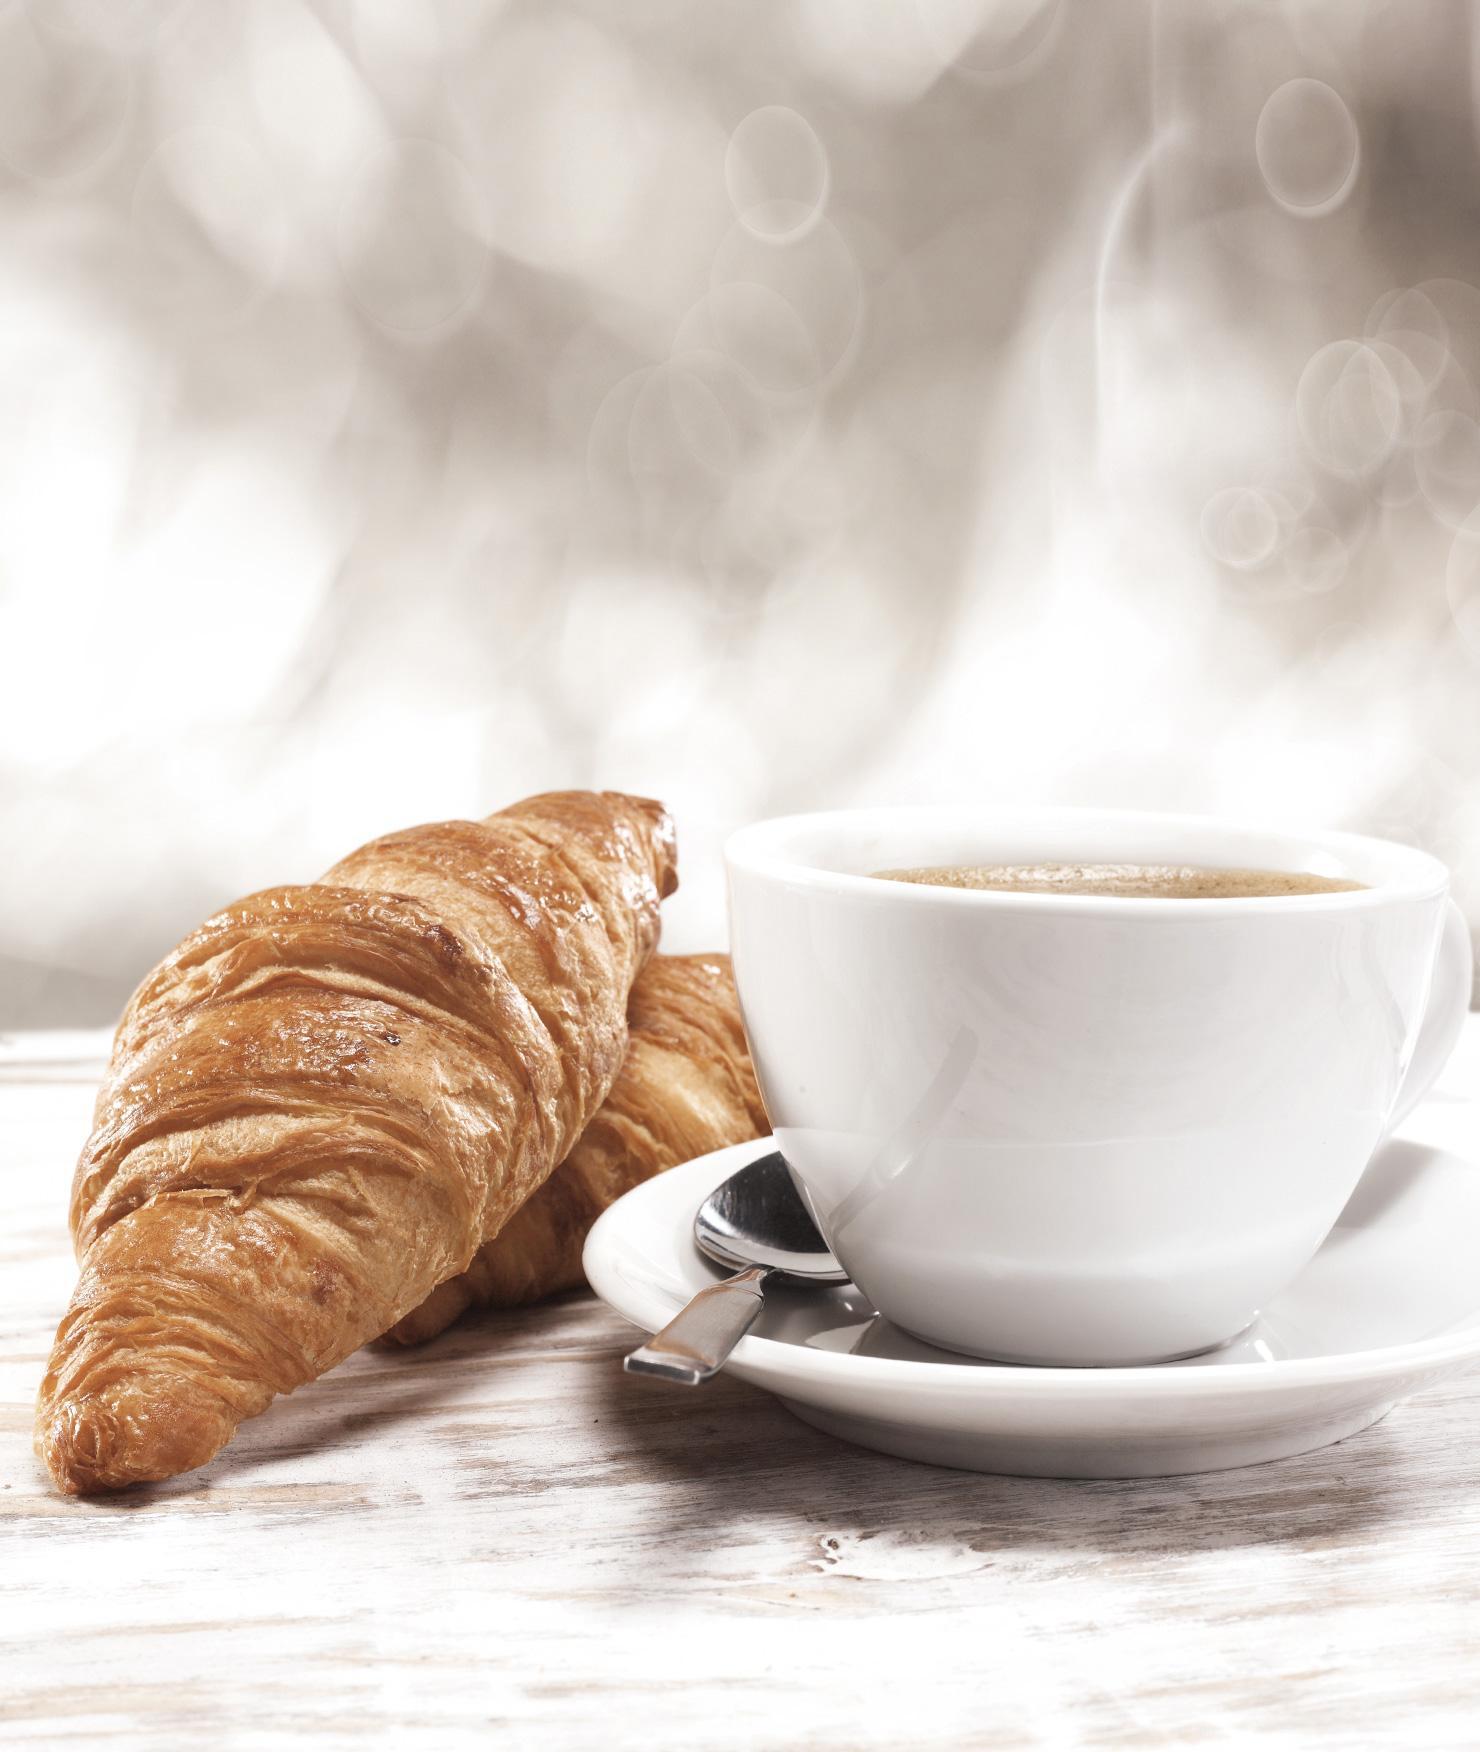 Filtr BRITA AquaGusto croissant filiżanka kawy